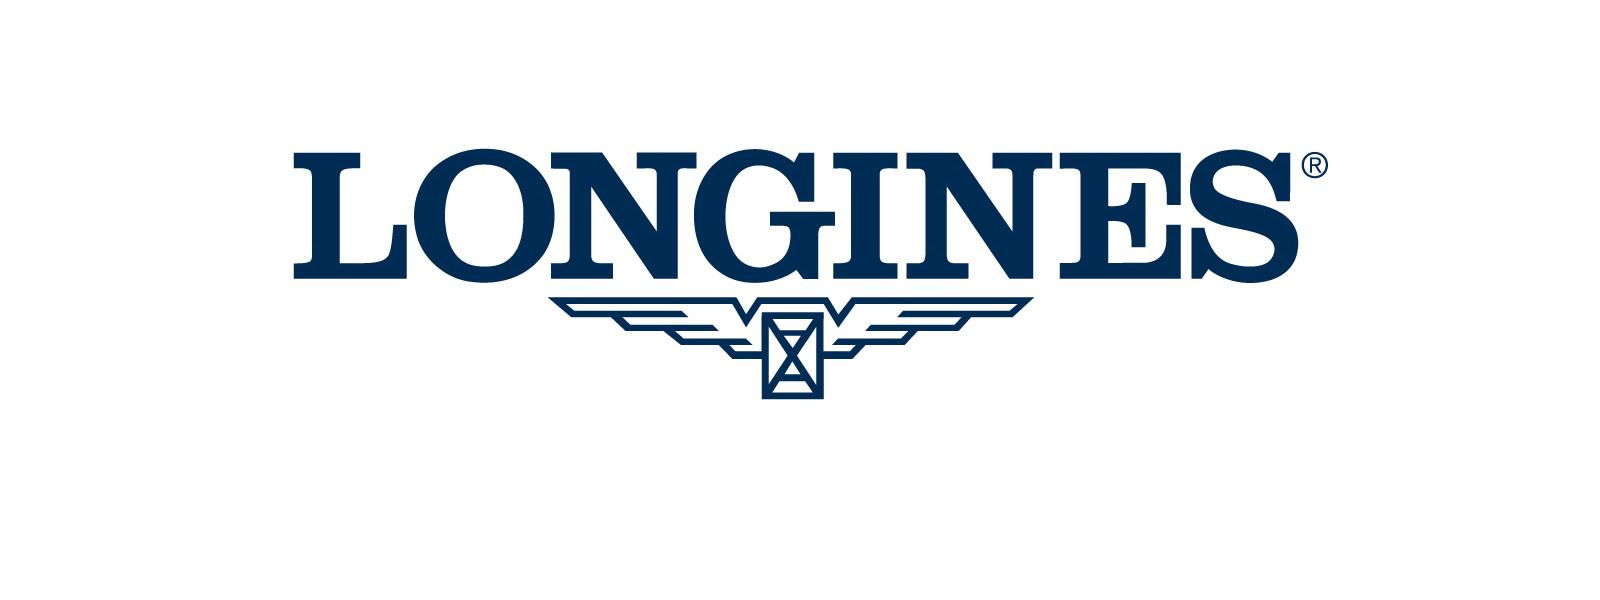 LONGINES_LOGO.jpg